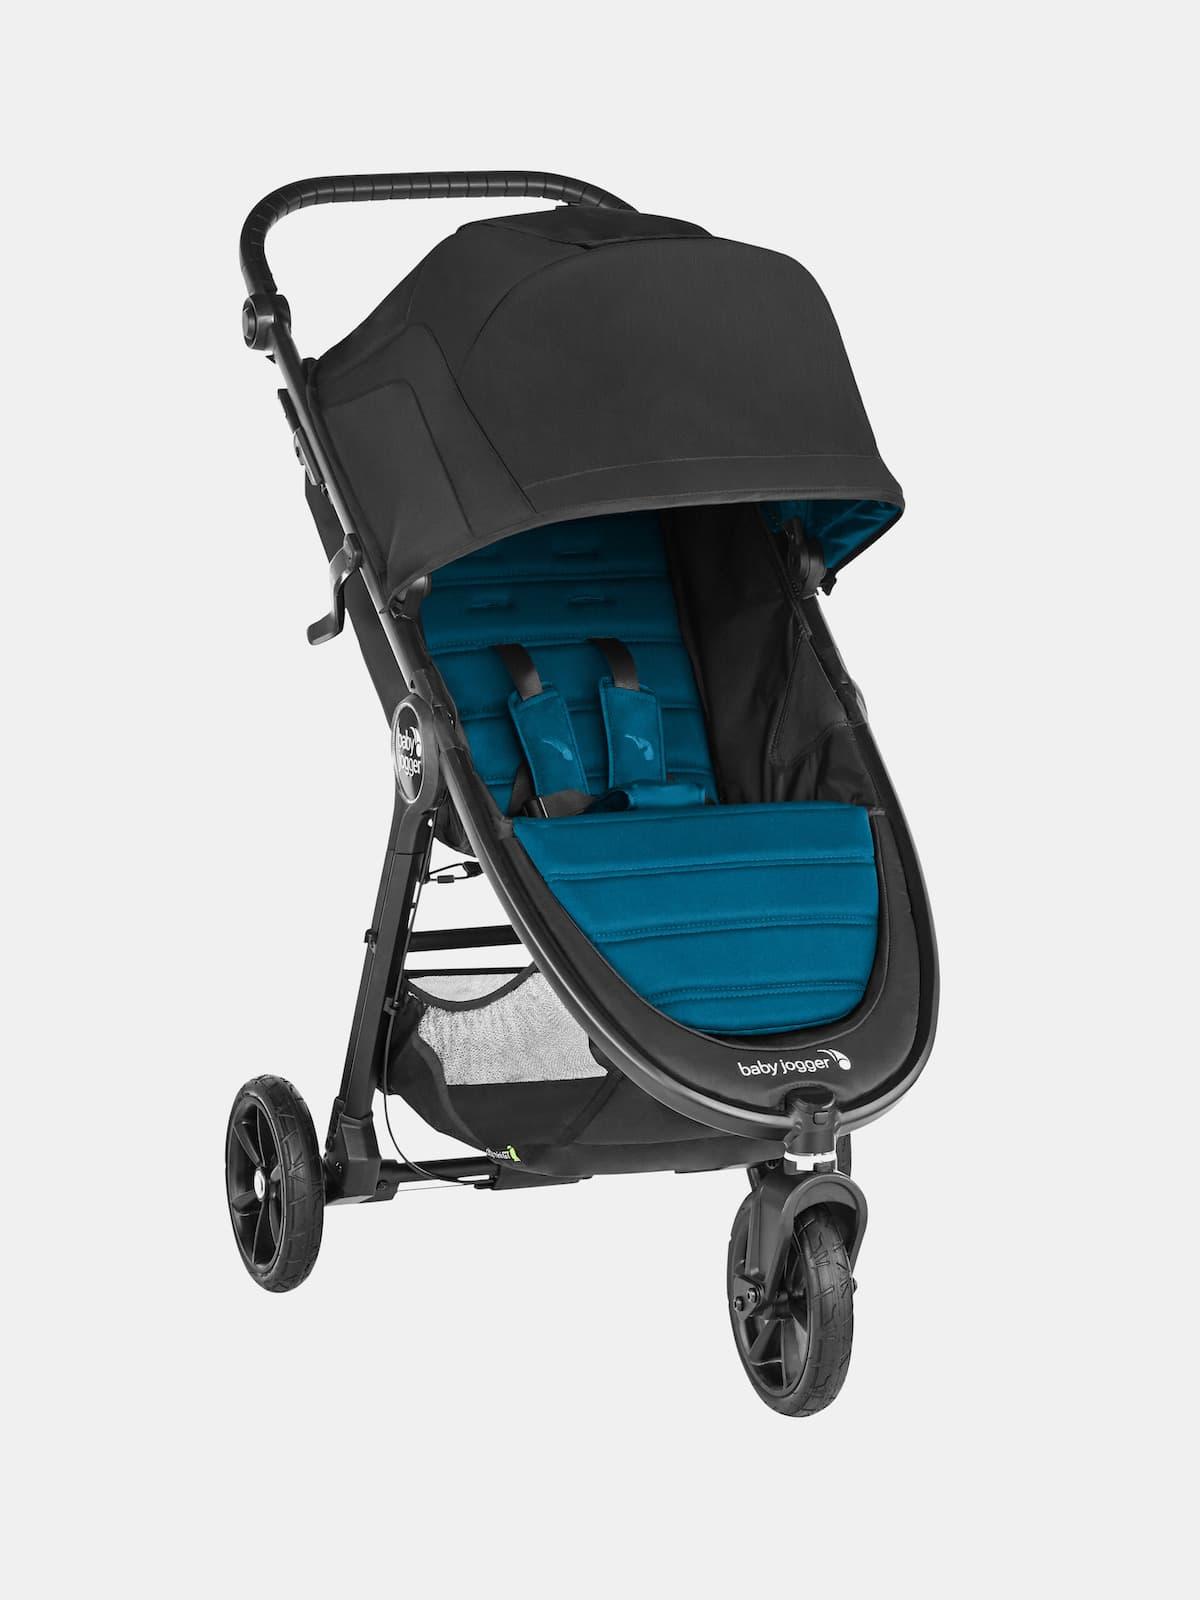 Baby Jogger city mini GT2 umbrella stroller